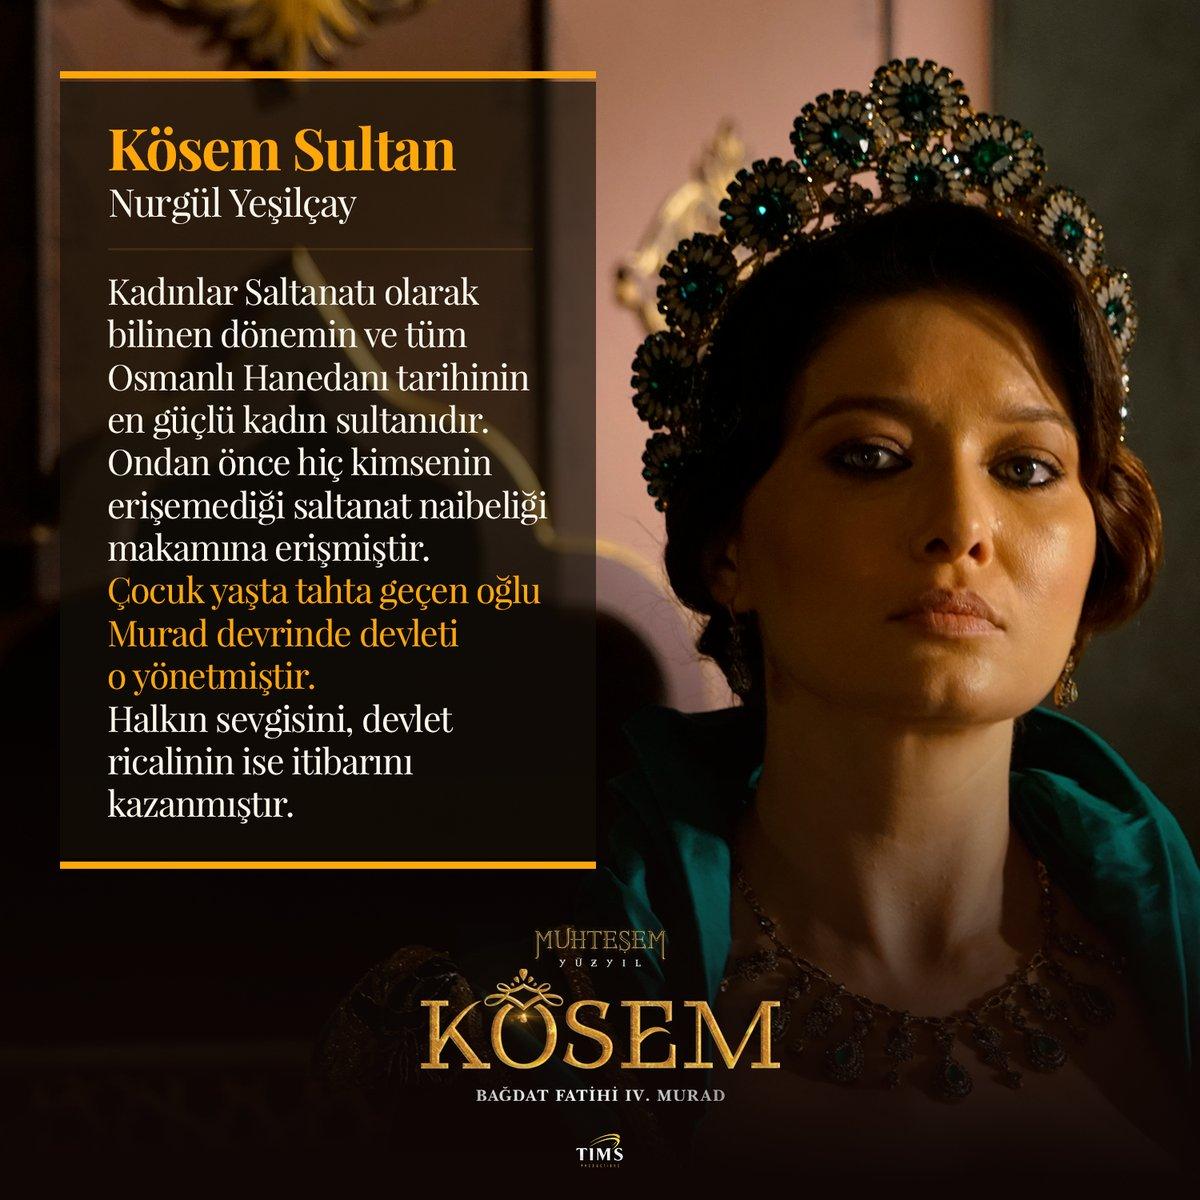 Великолепный век. Кесем - 2 сезон - Muhteşem Yüzyıl Kösem PROMO (1).jpg